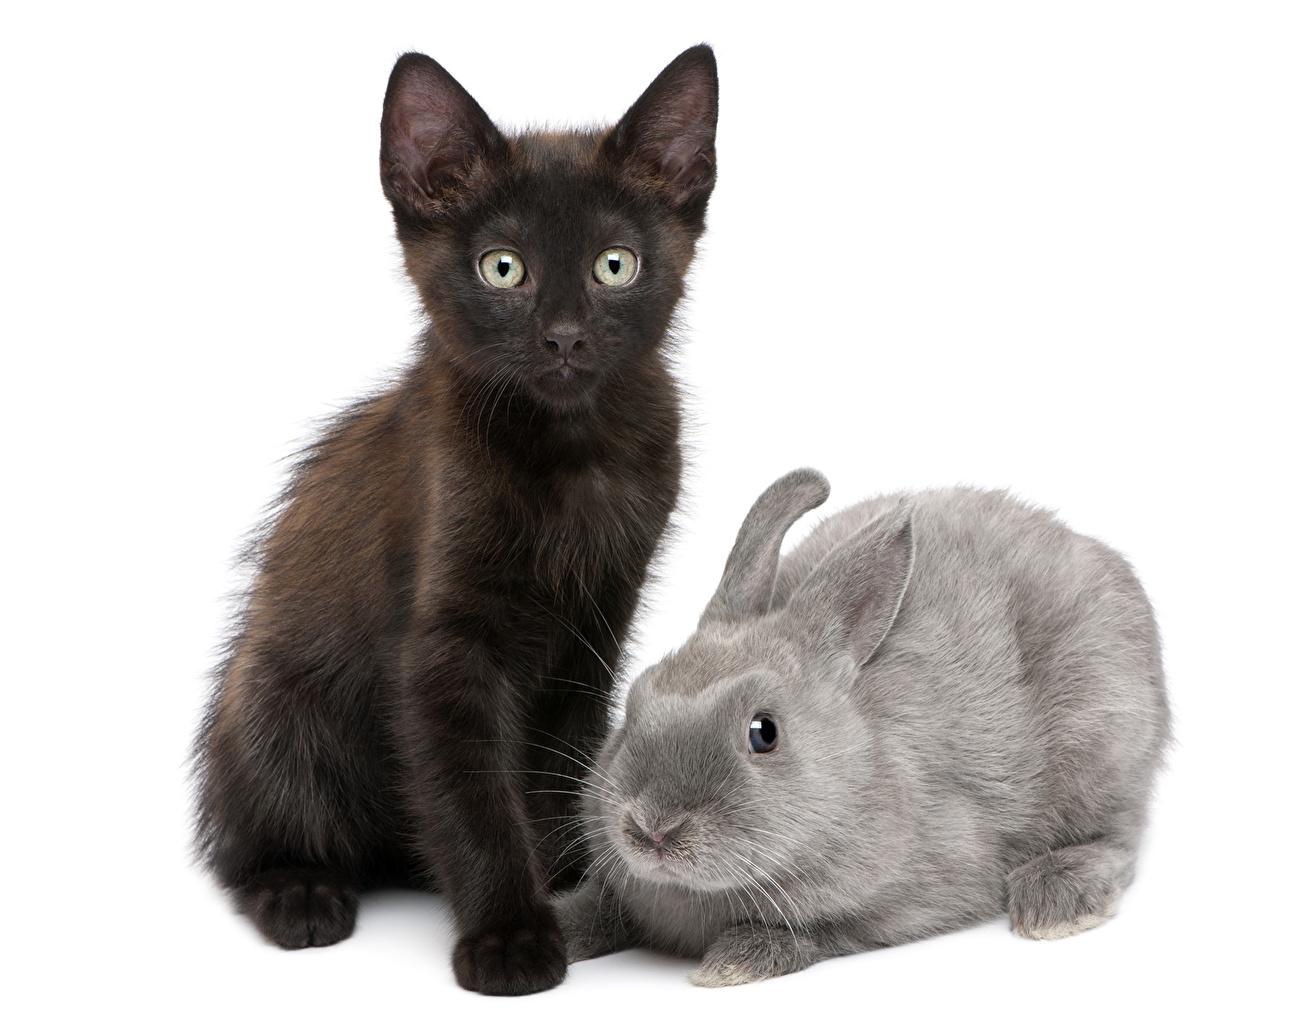 Desktop Wallpapers cat Rabbits Two animal Cats rabbit 2 Animals